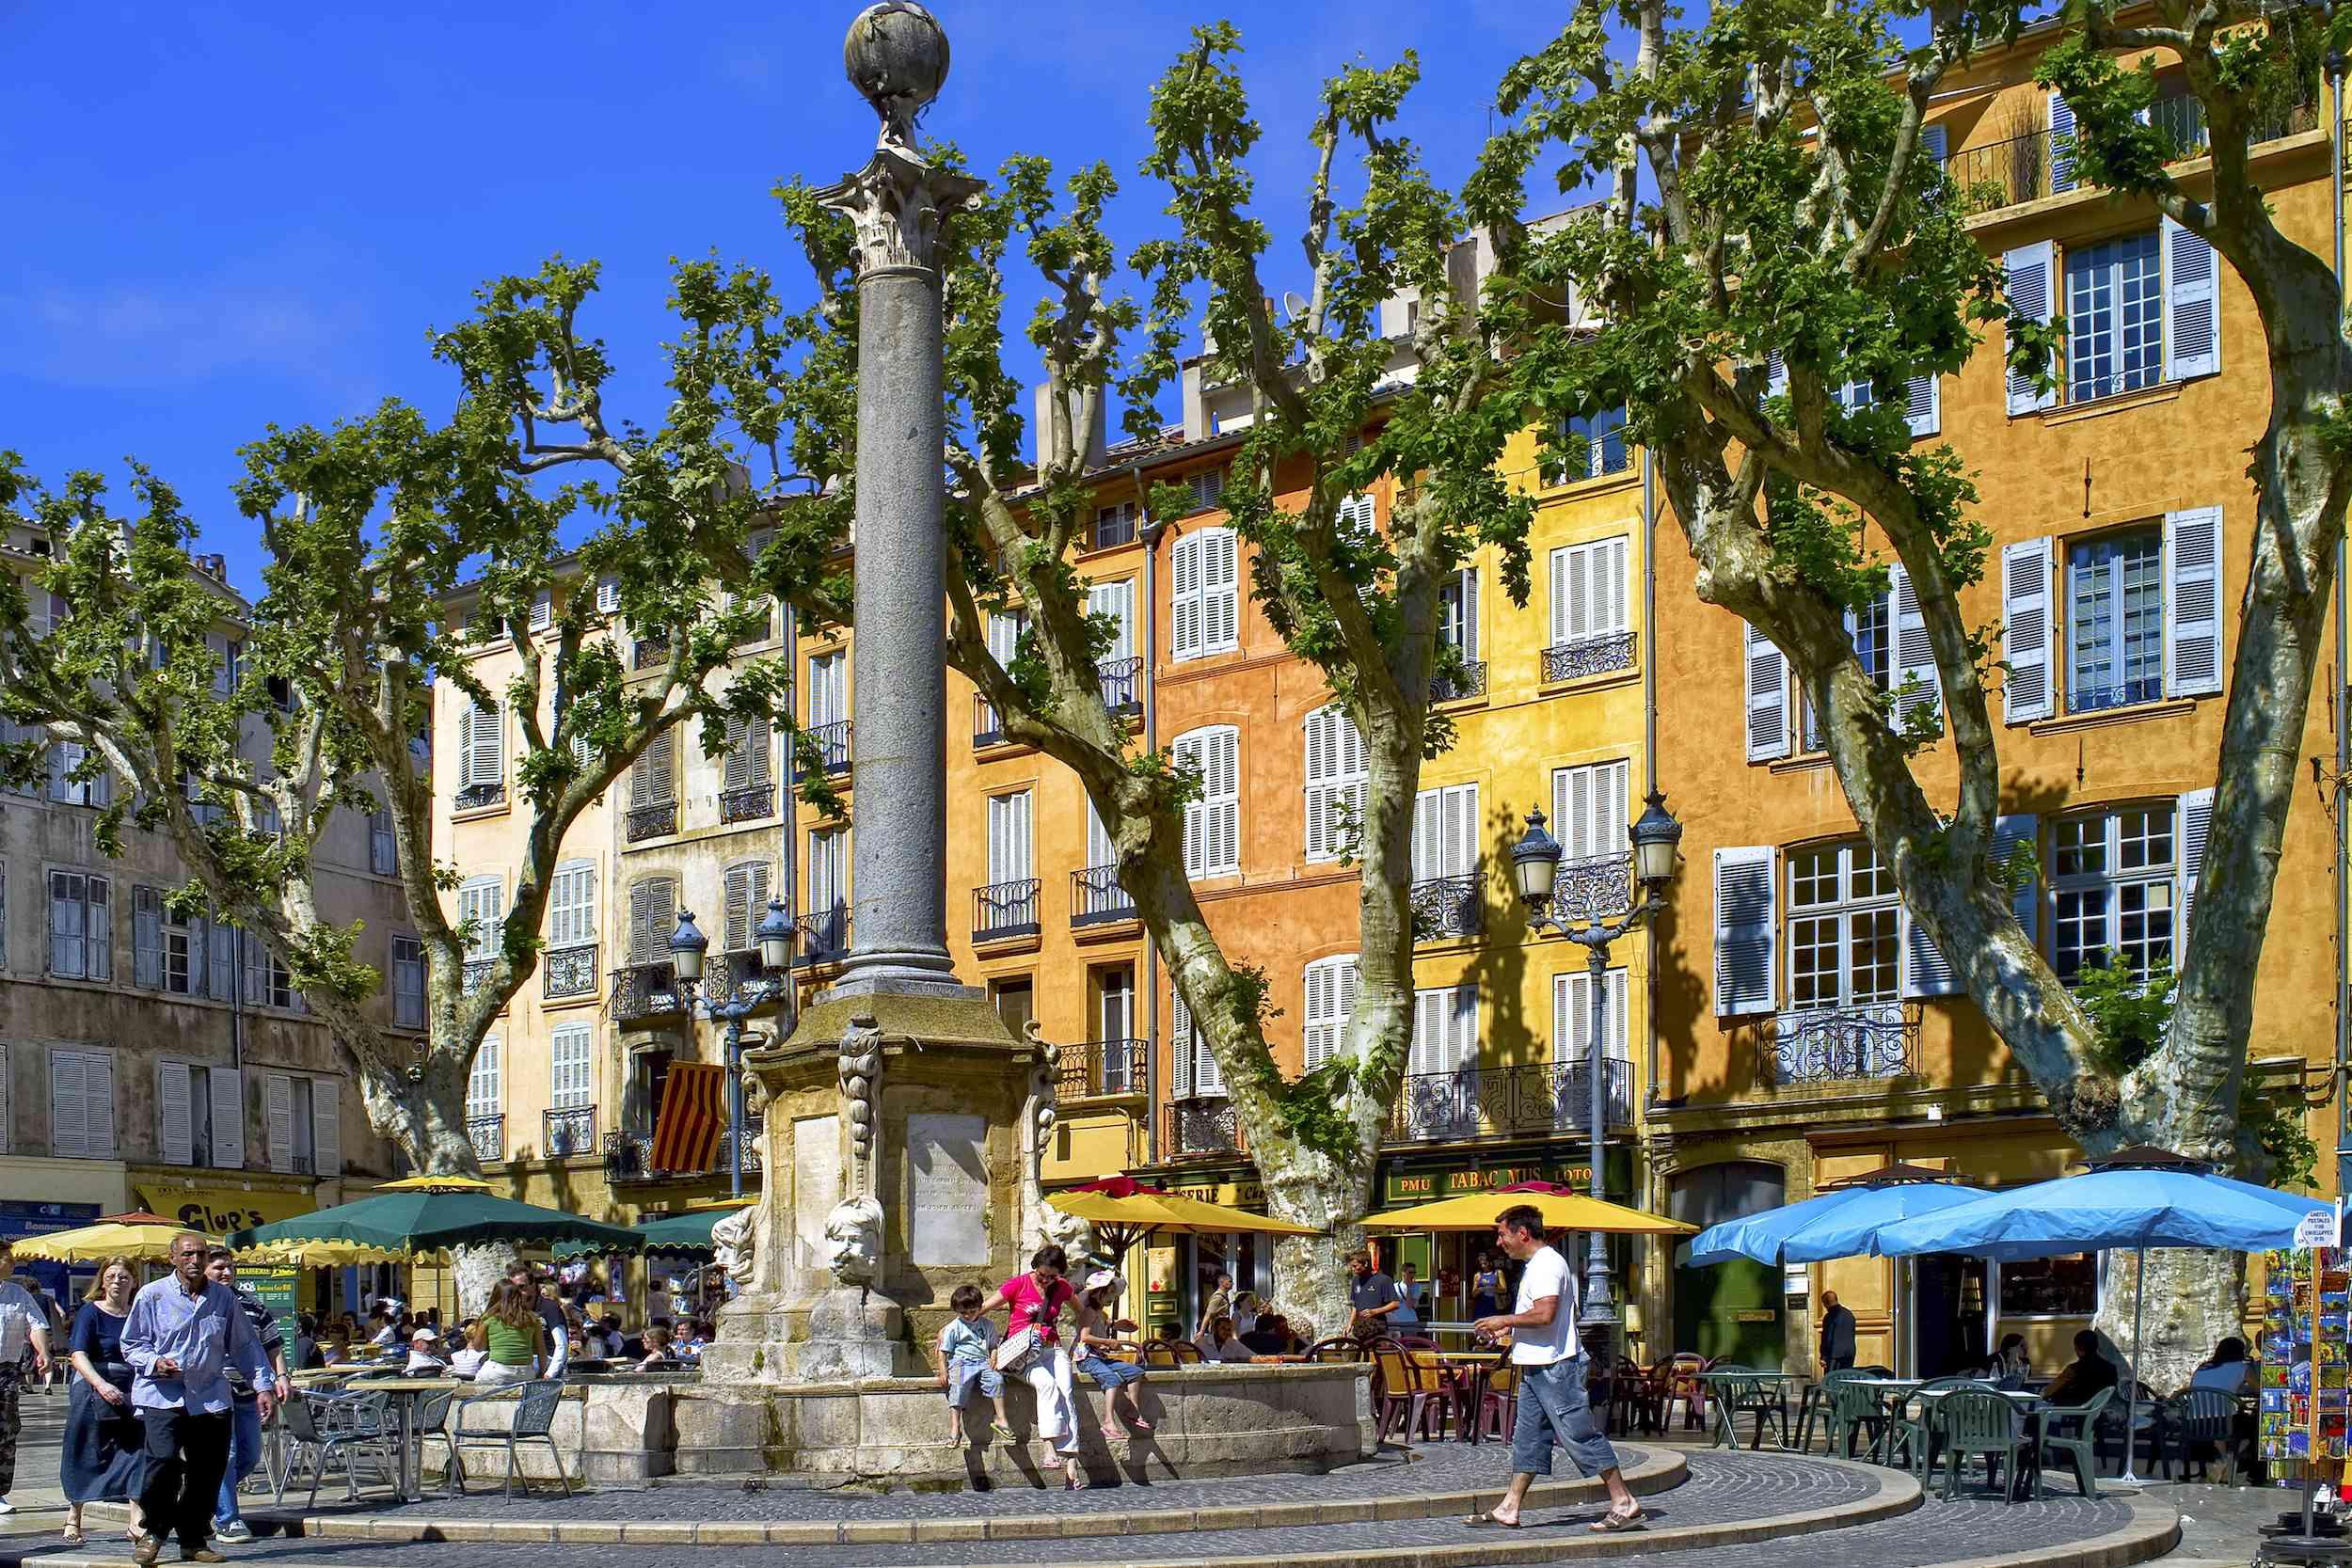 Aix-en-Provence, sunny buildings in France